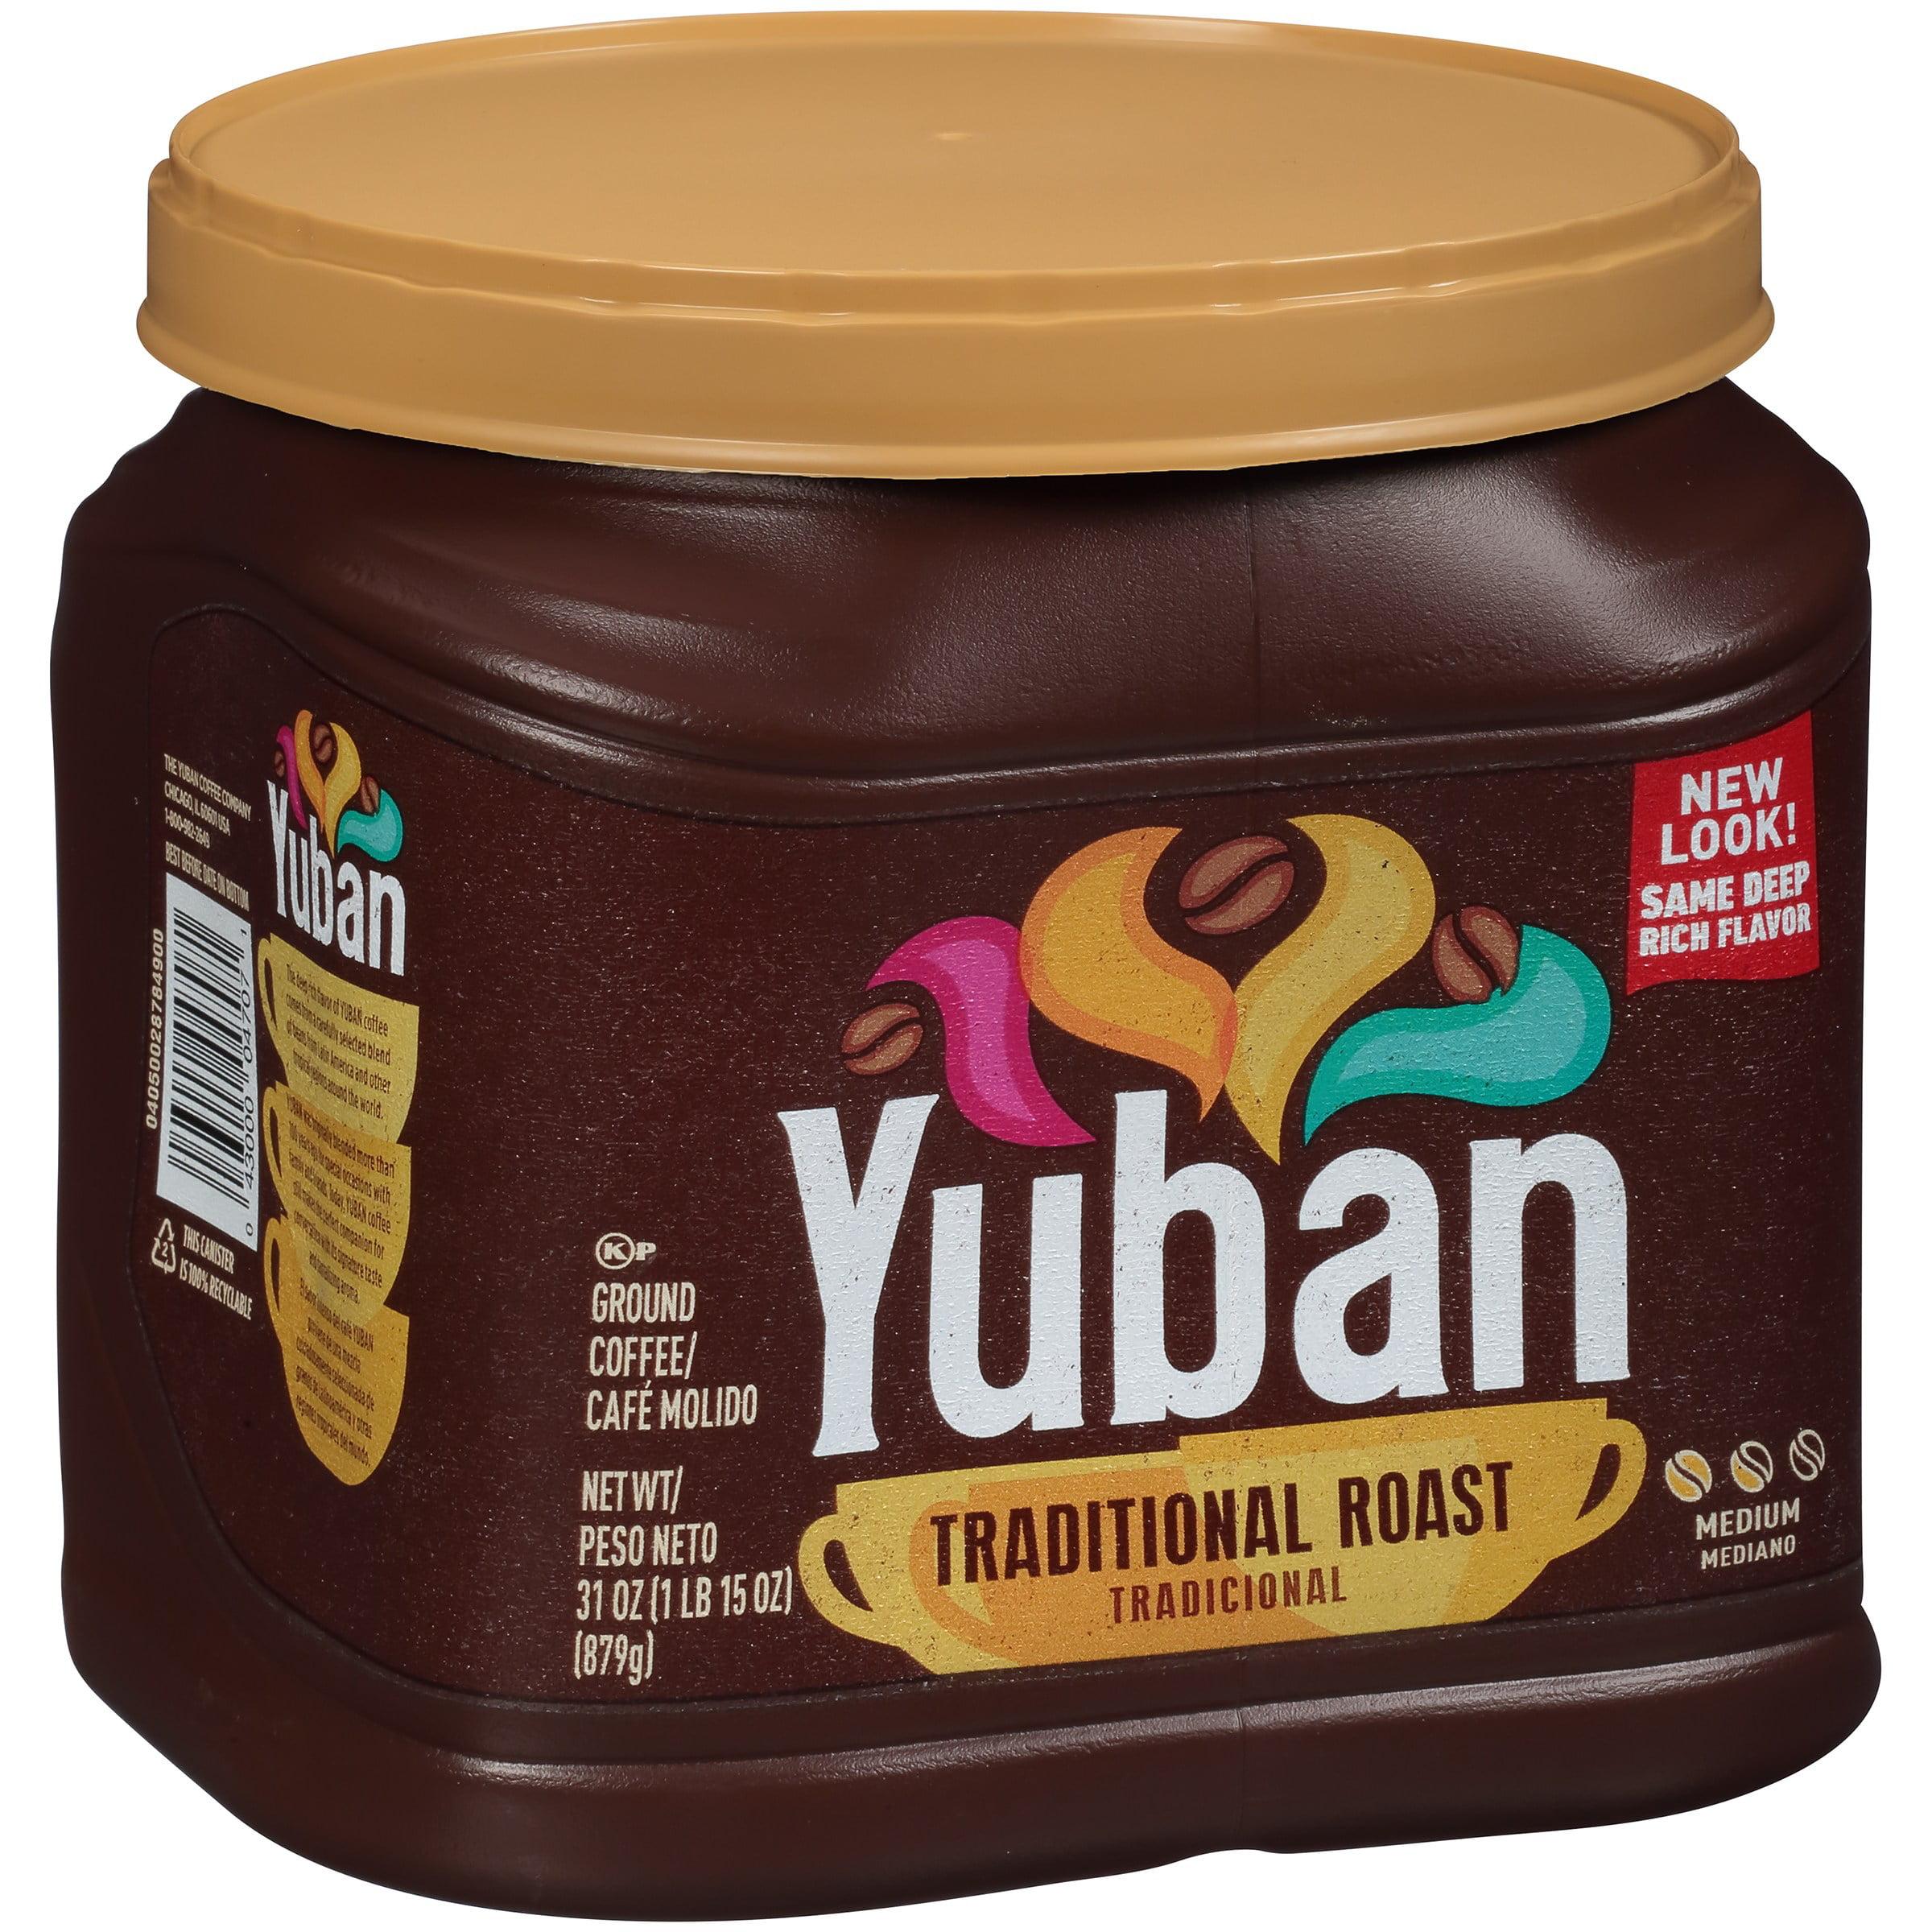 Yuban Original Premium Ground Coffee Medium Roast, 31 oz